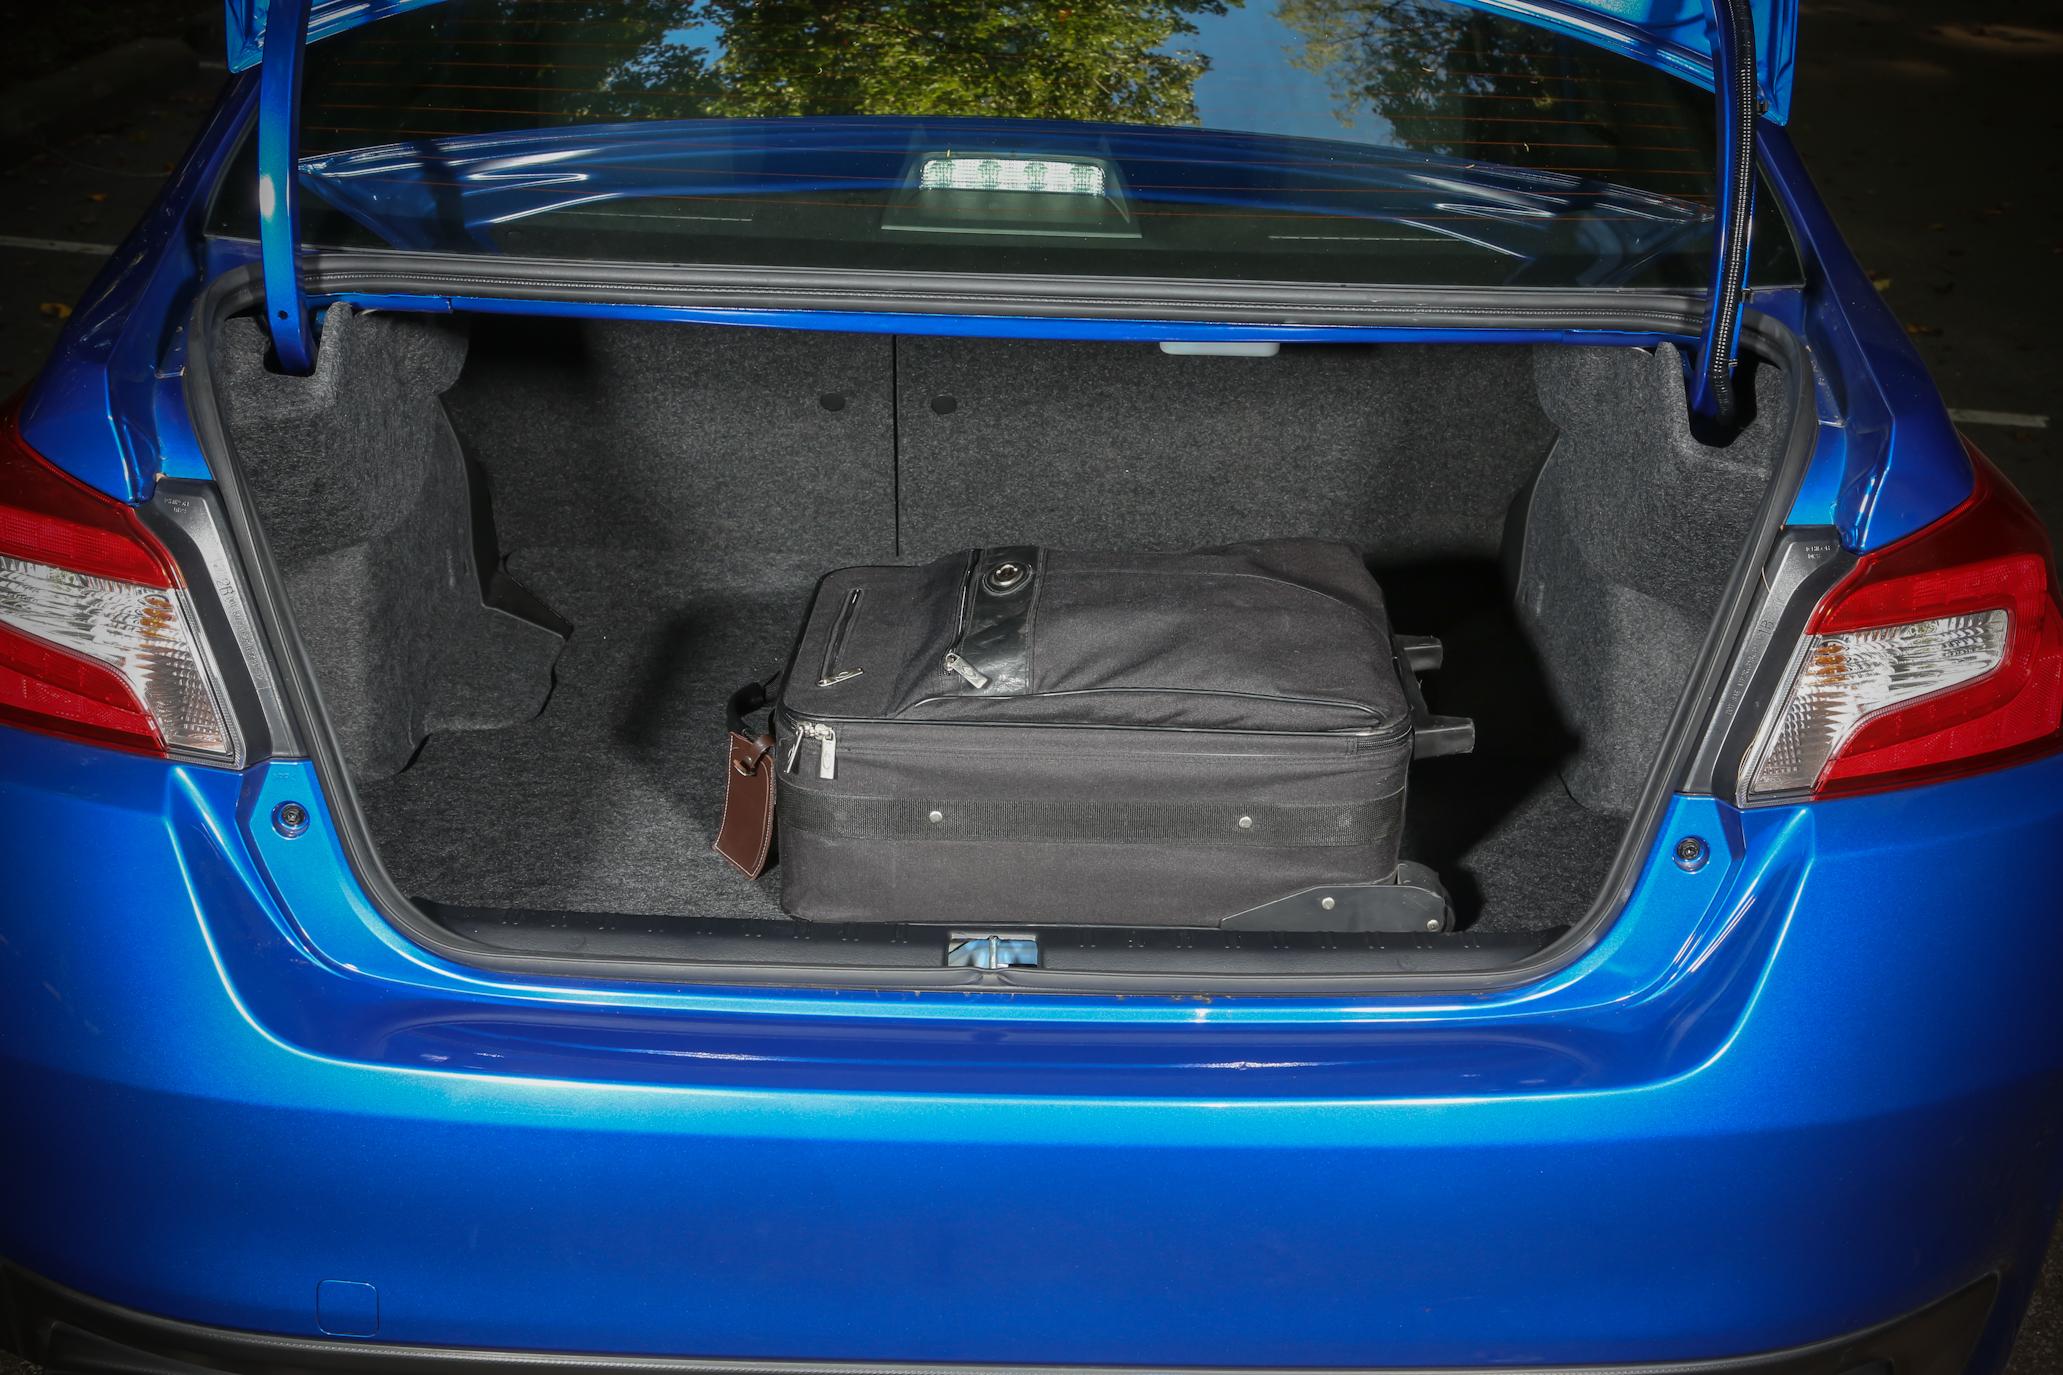 2015 Subaru WRX Trunk Space